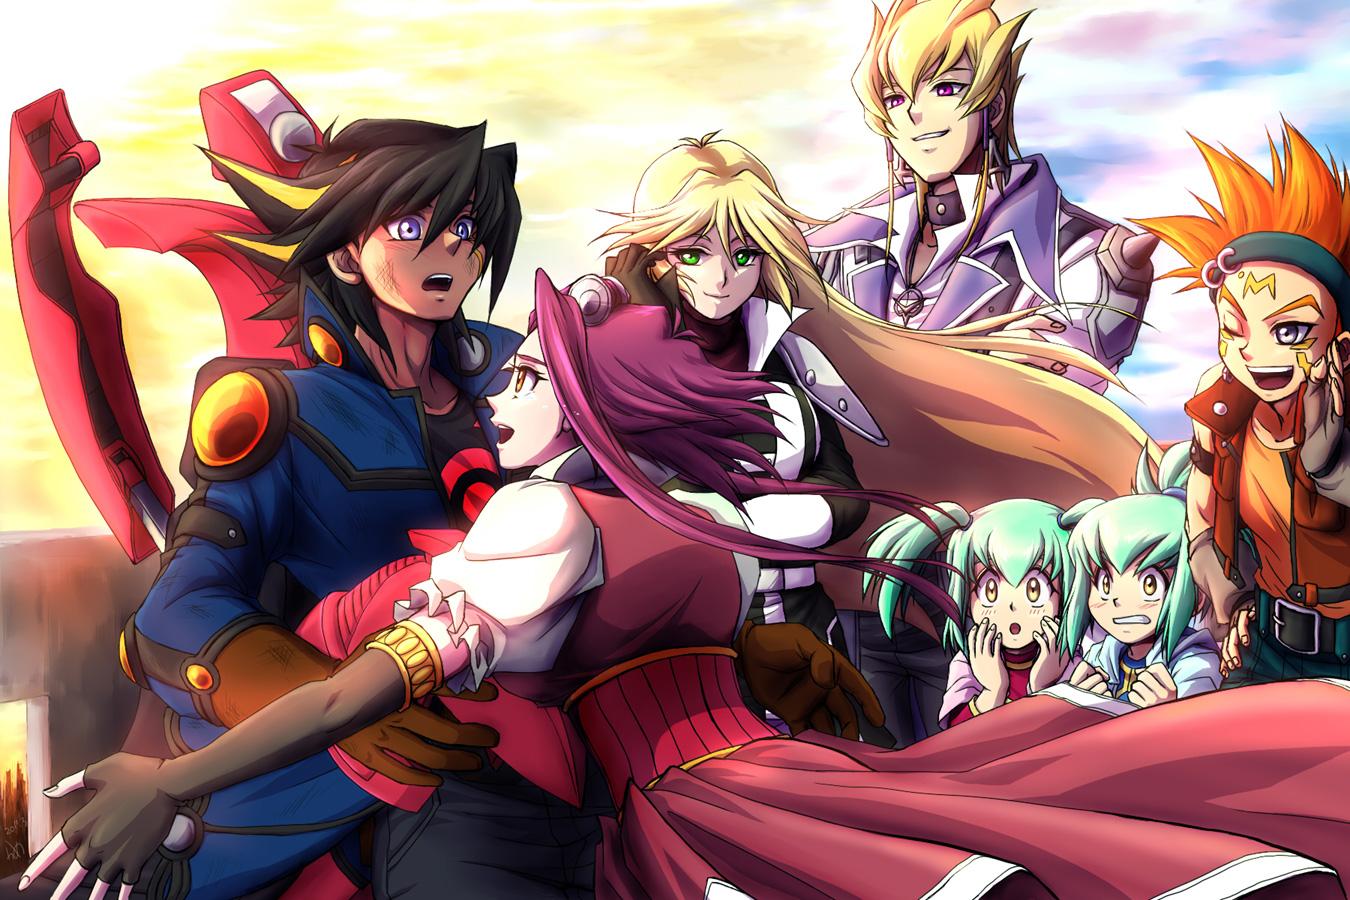 Yu-Gi-Oh! 5D's, Wallpaper - Zerochan Anime Image Board  Yu-Gi-Oh! 5D...